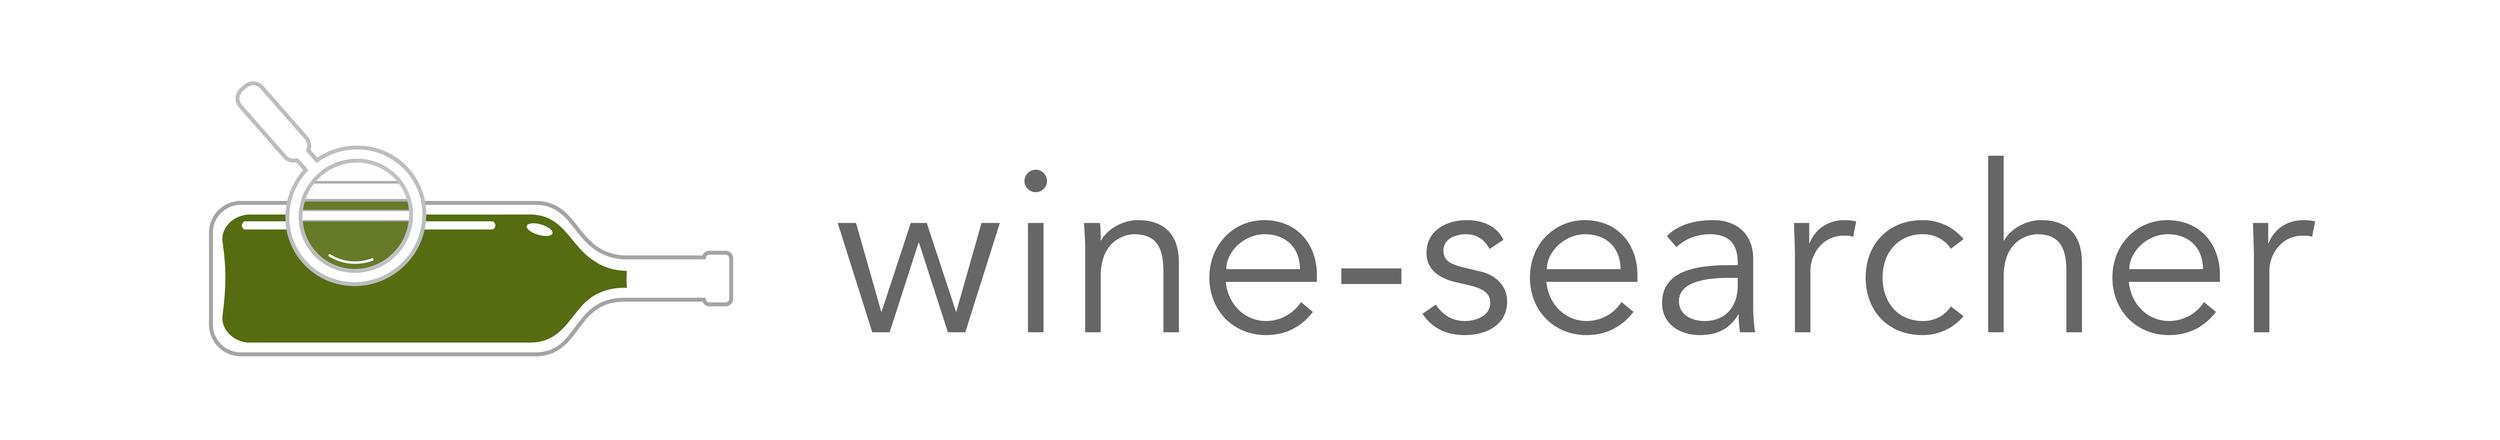 Wine Searcher - September 2018